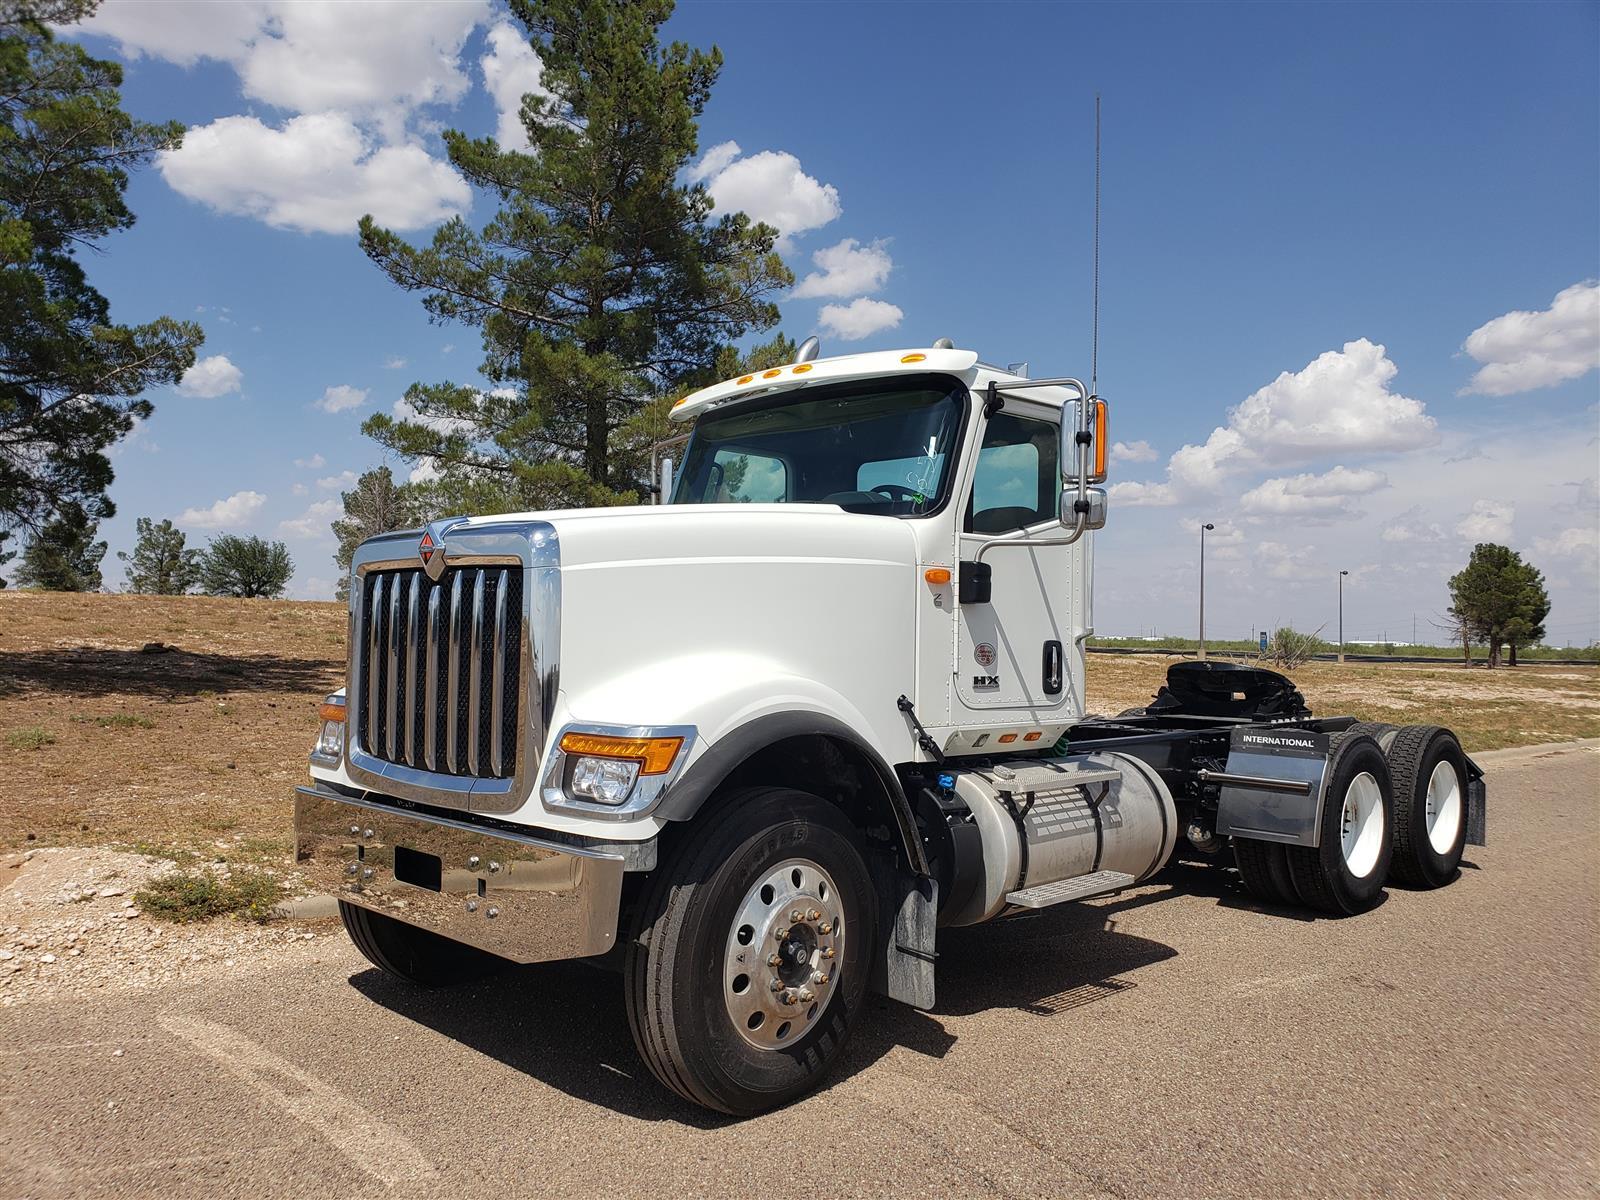 2019 International HX 6x4, Tractor #KN363152 - photo 1